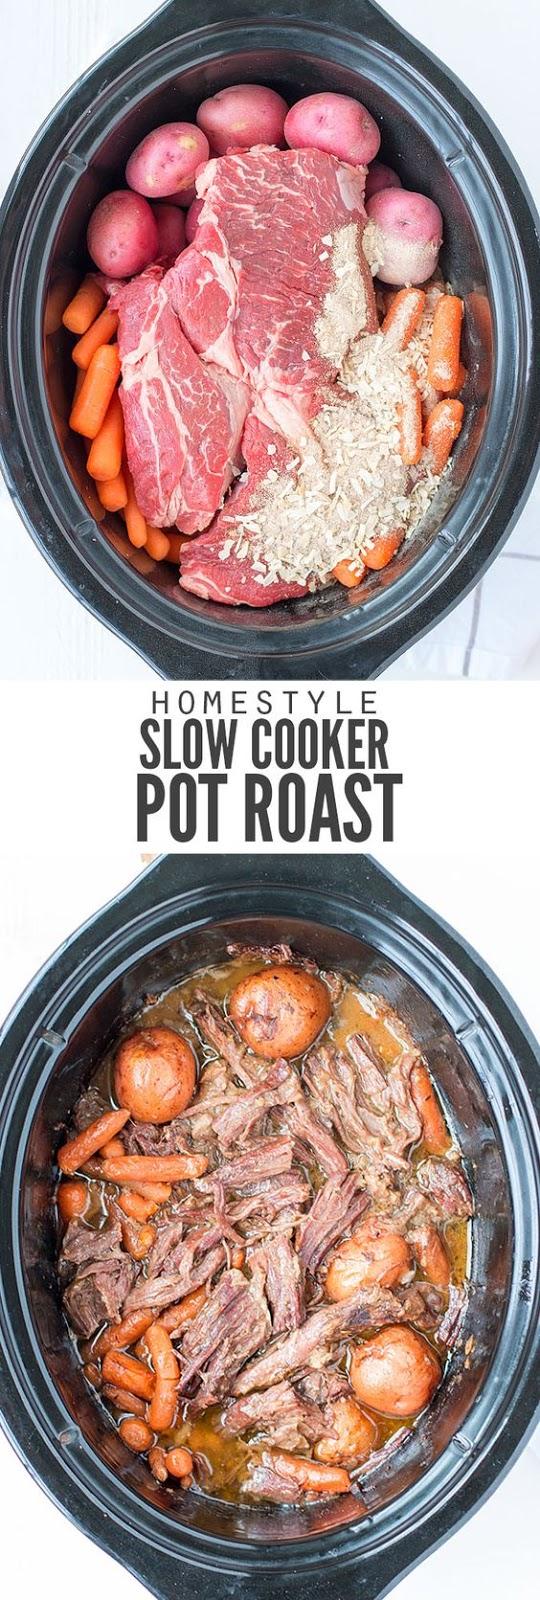 CLASSIC SLOW COOKER POT ROAST #roast #cookerpotroast #homestyle #potroast #healthyrecipes #healthydinner #easyrecipes